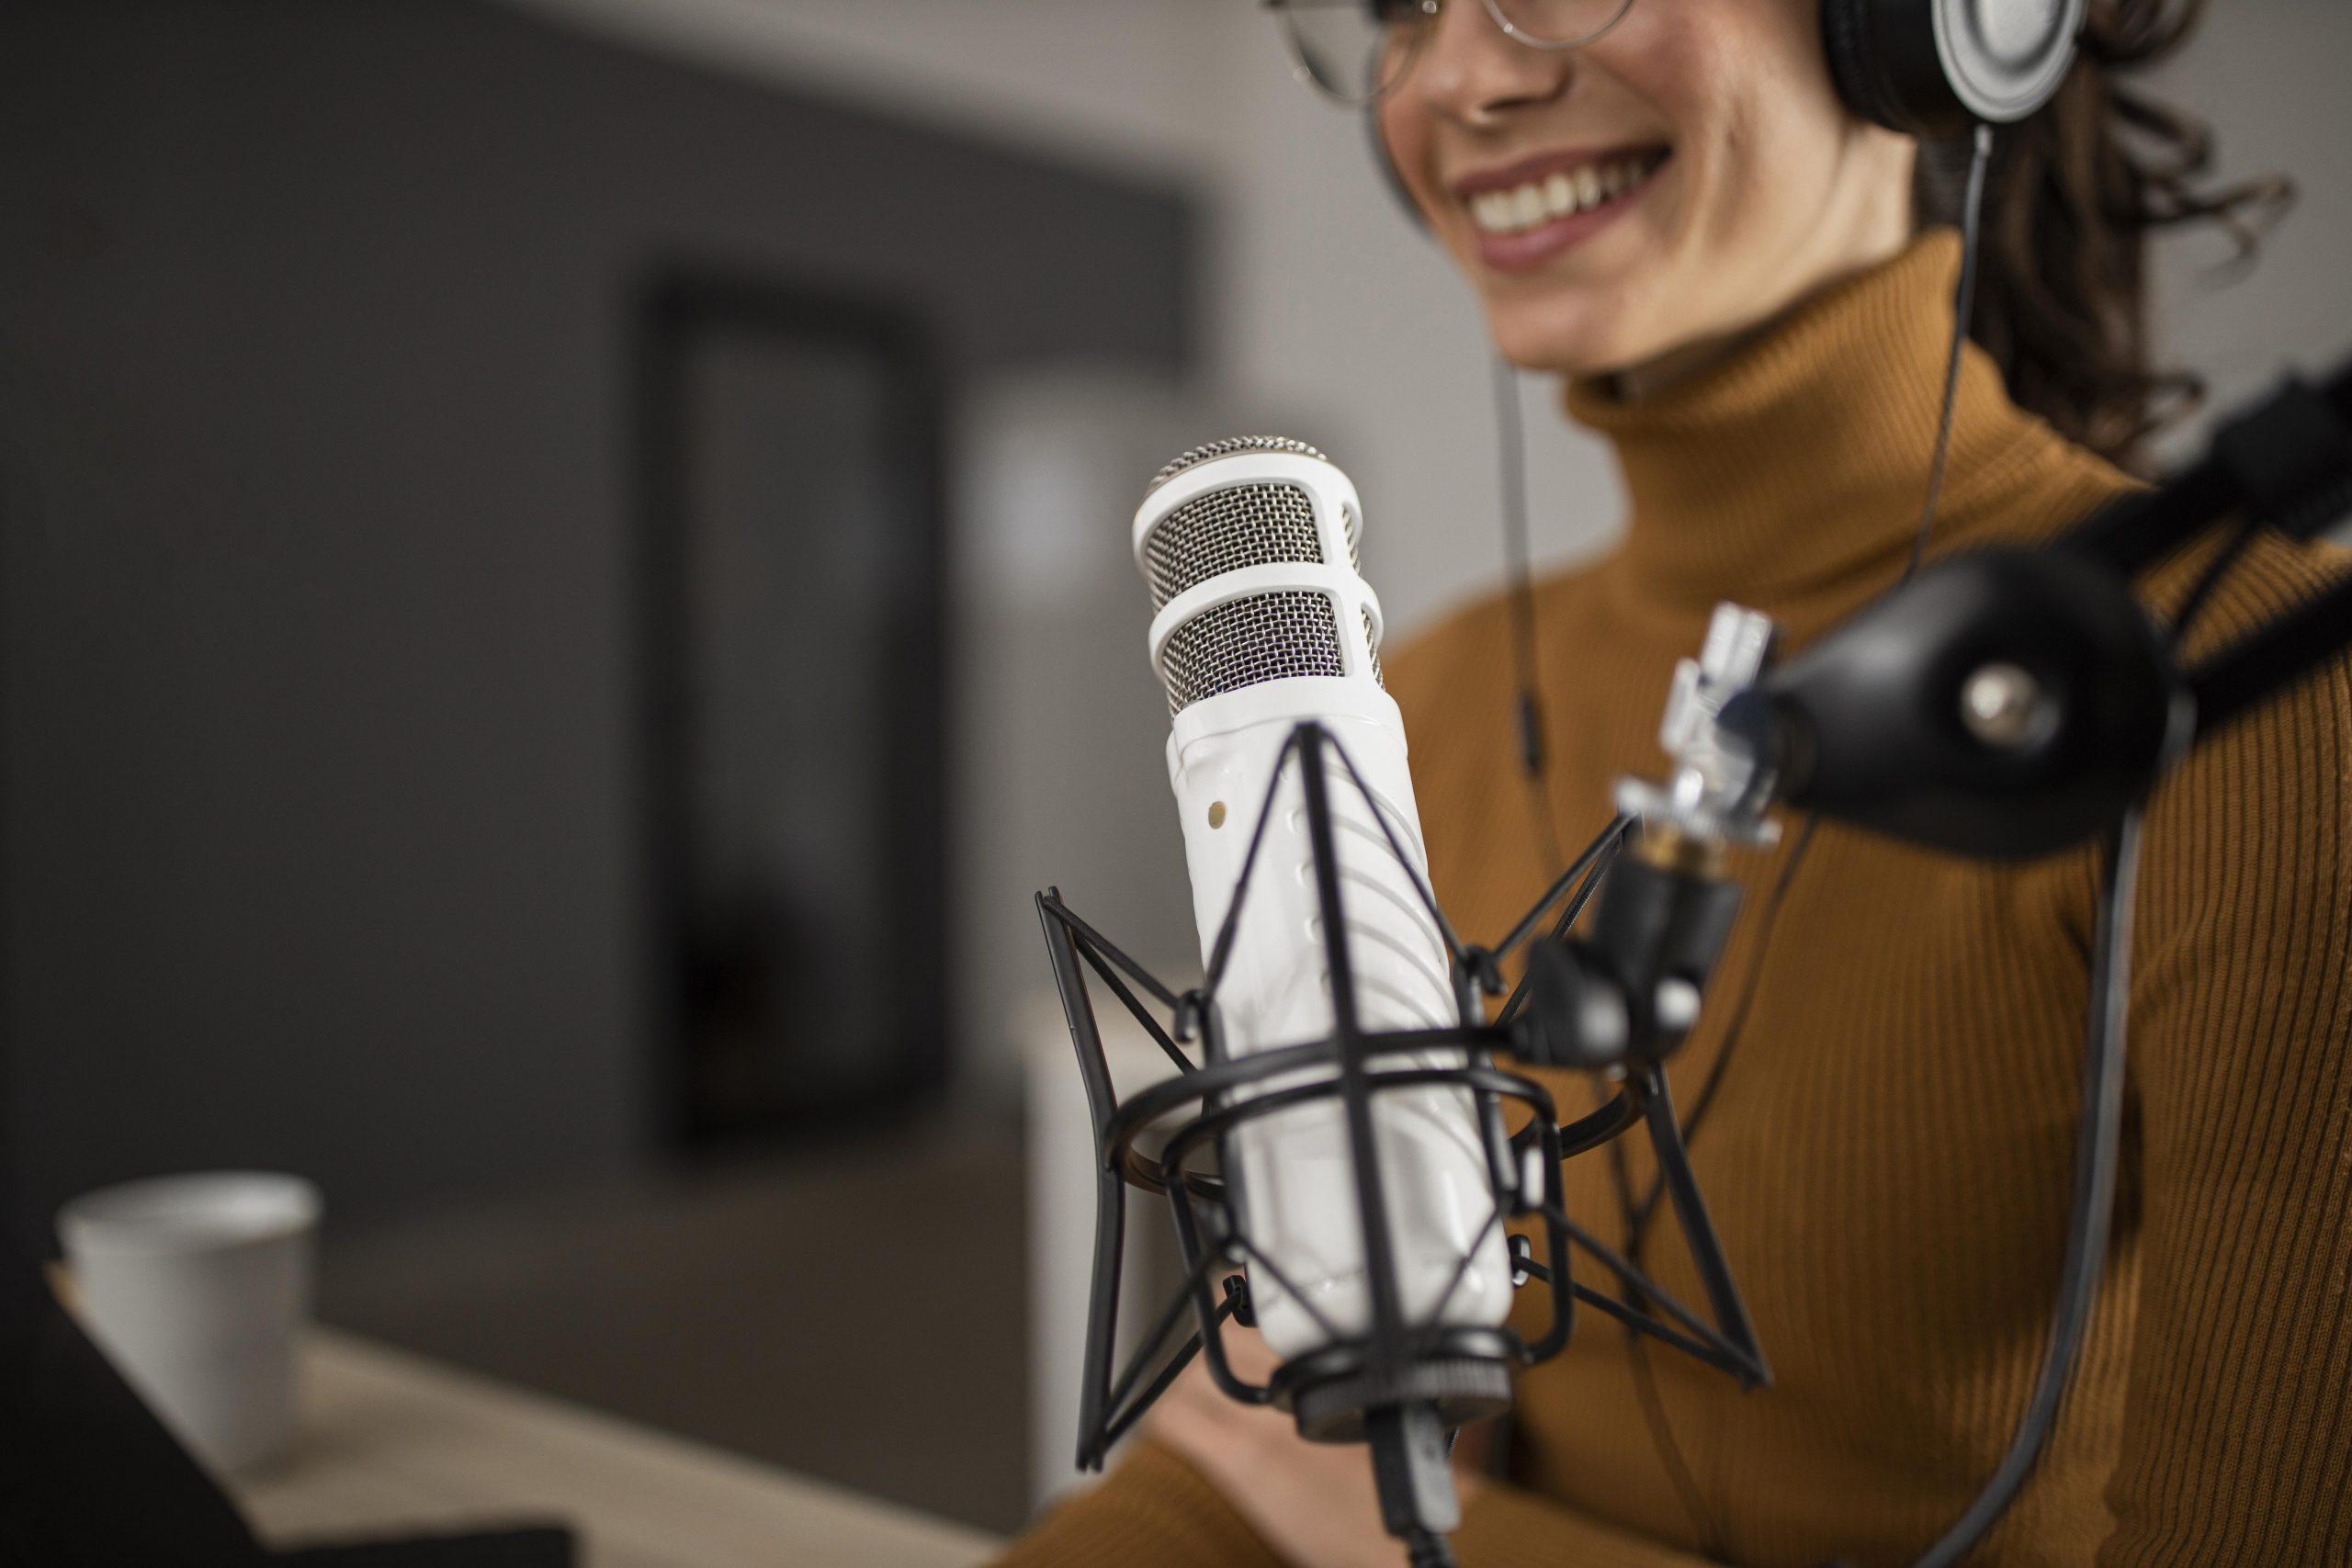 Der Podcast als Kommunikationskanal